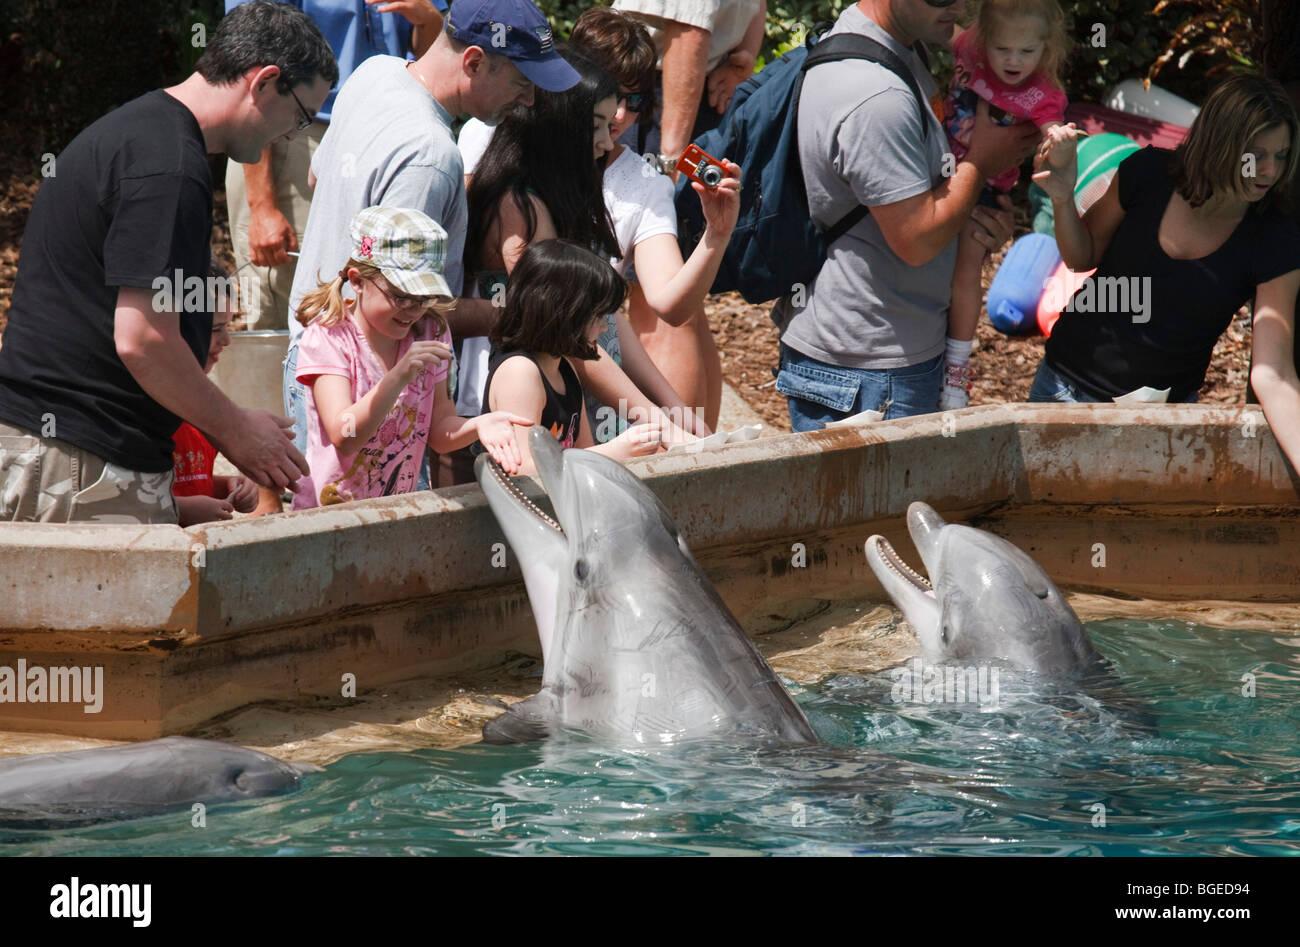 People feed bottlenose dolphins at Seaworld, Orlando, Florida - Stock Image